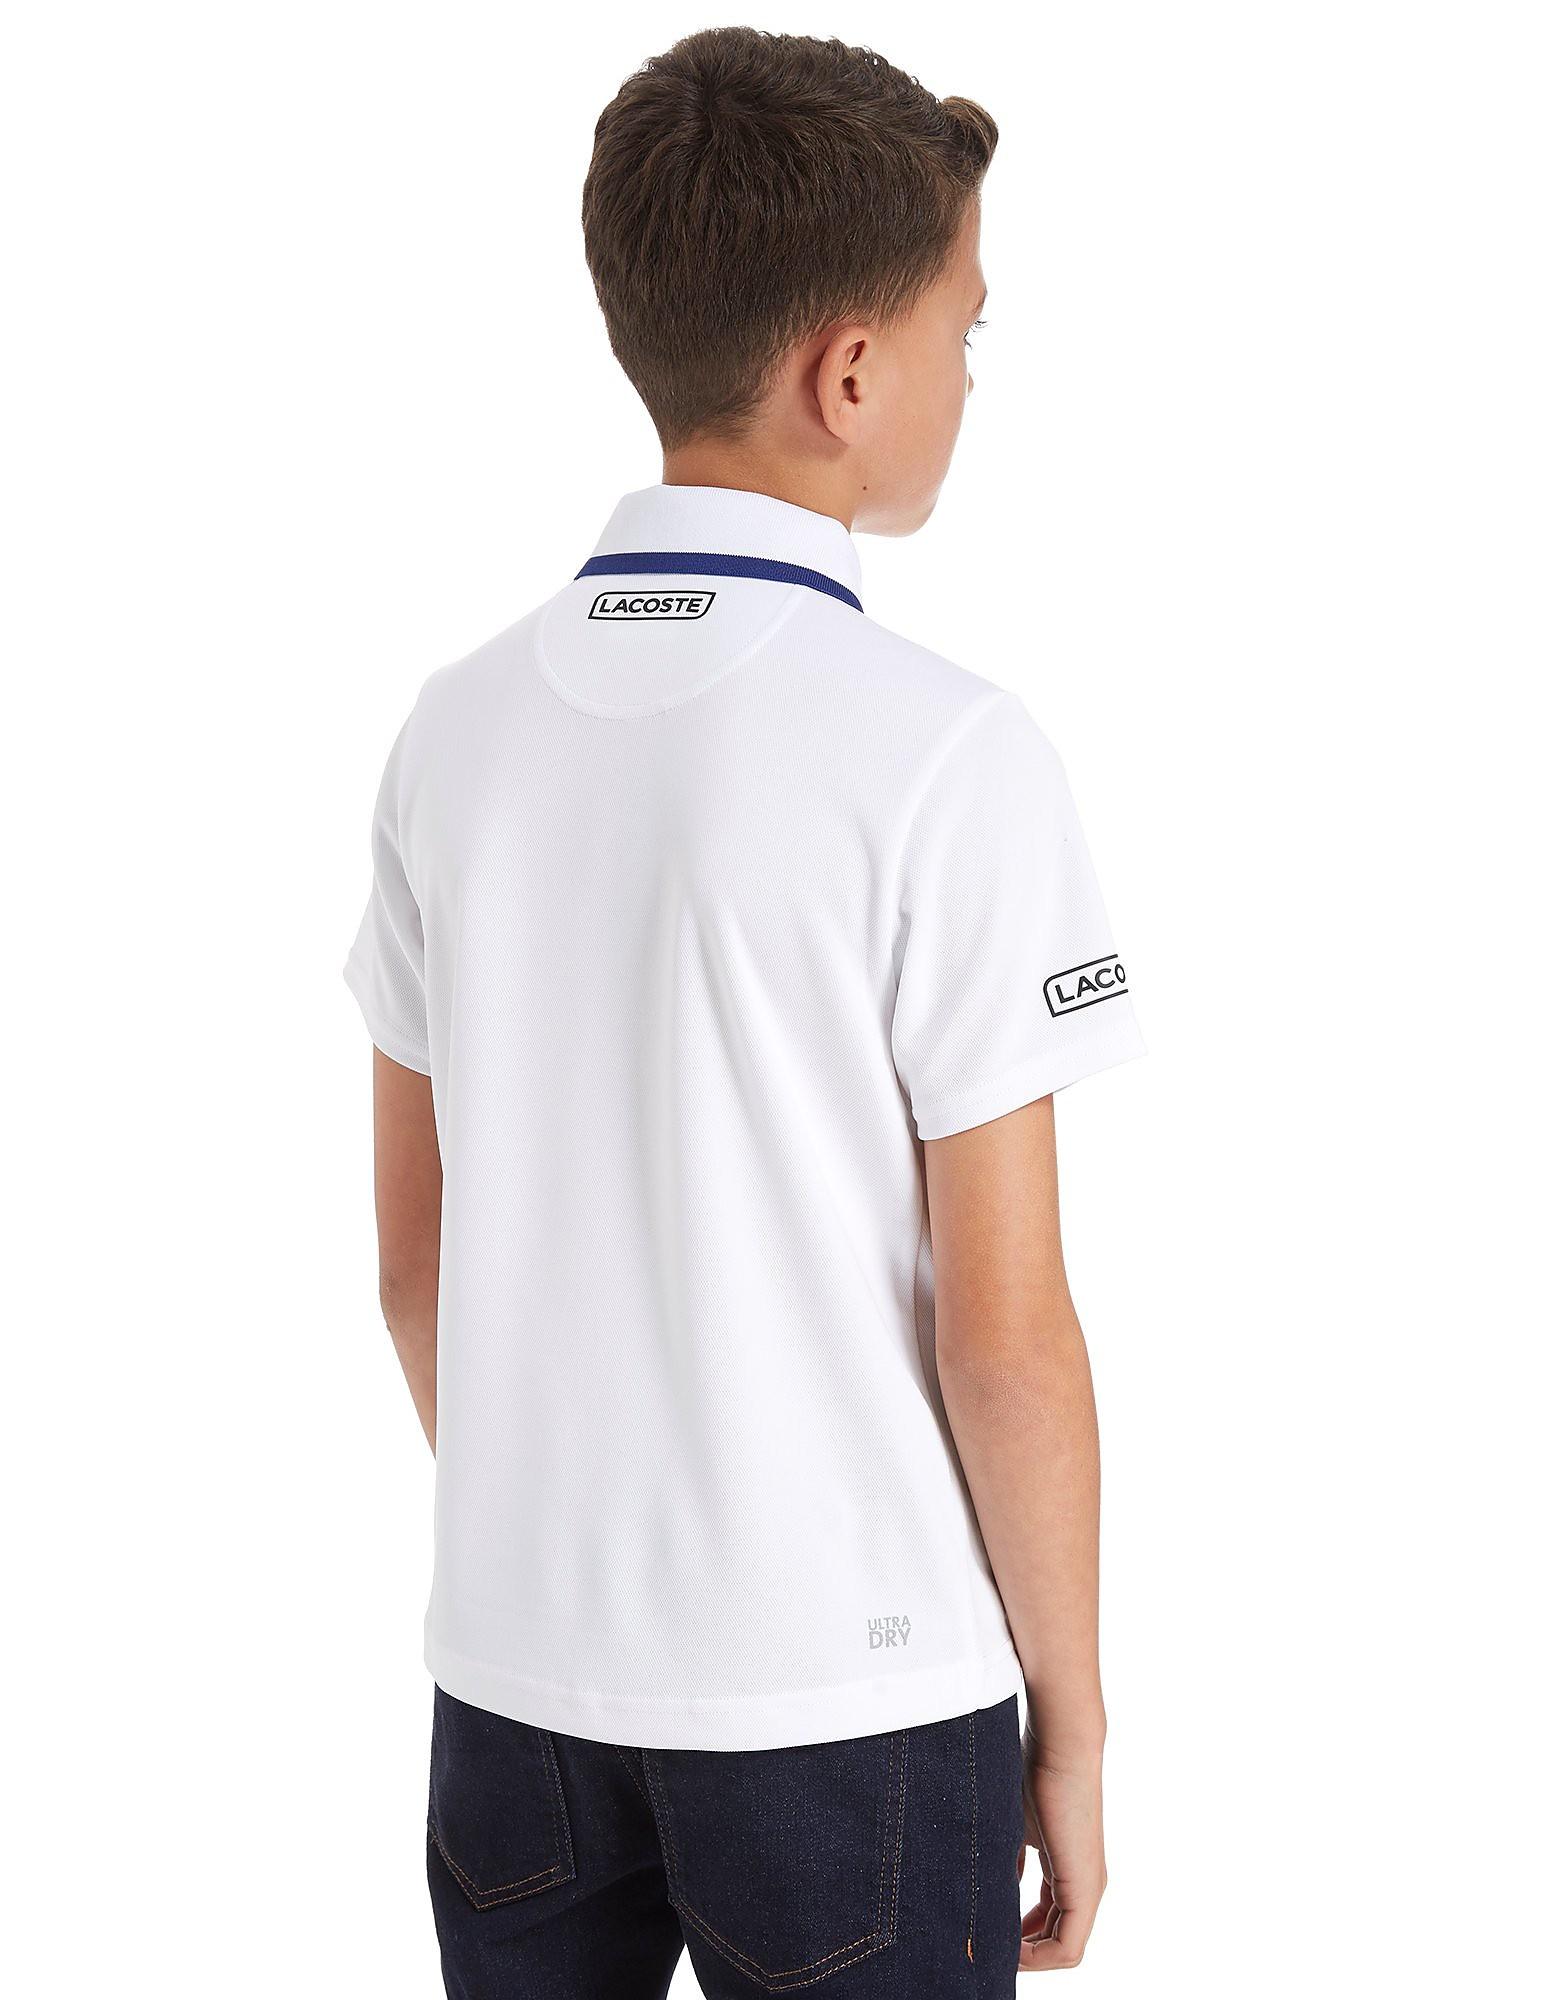 Lacoste Tennis Polo Shirt Junior